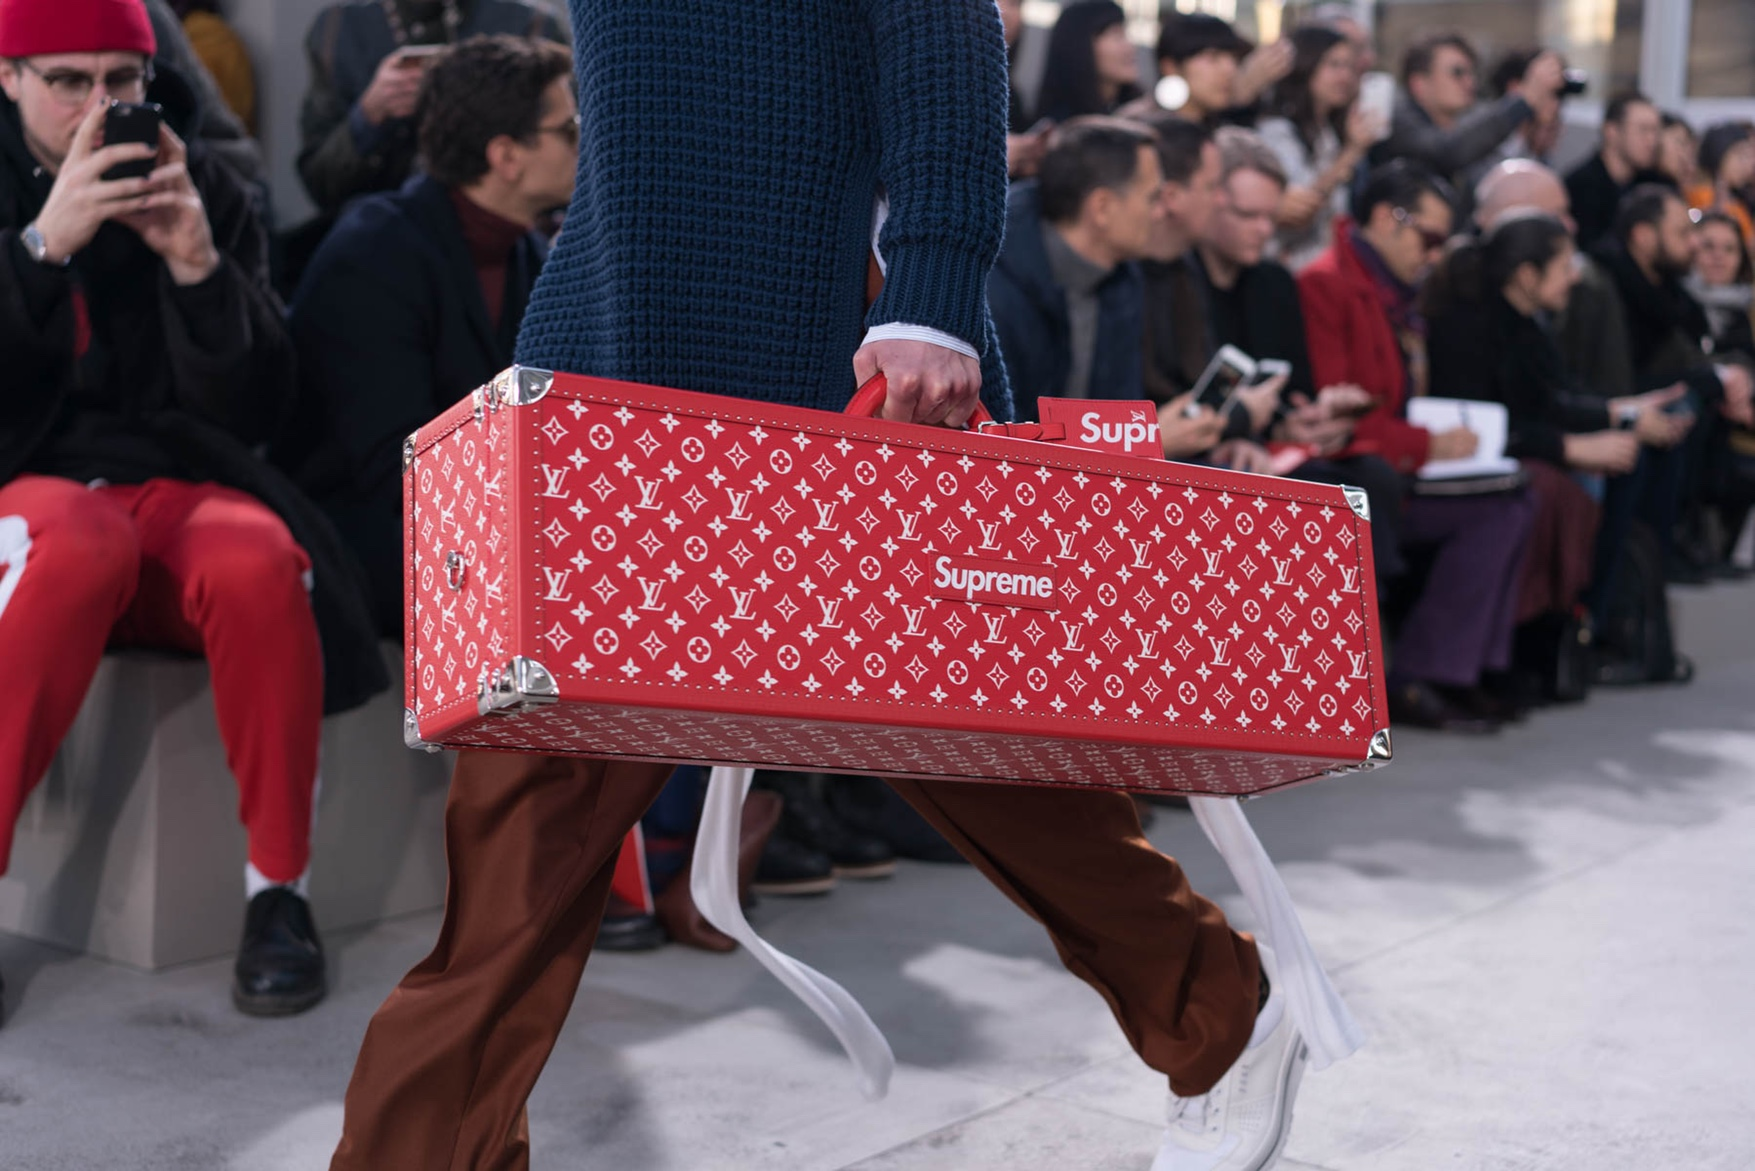 New York Denies Supreme x Louis Vuitton Pop-Up